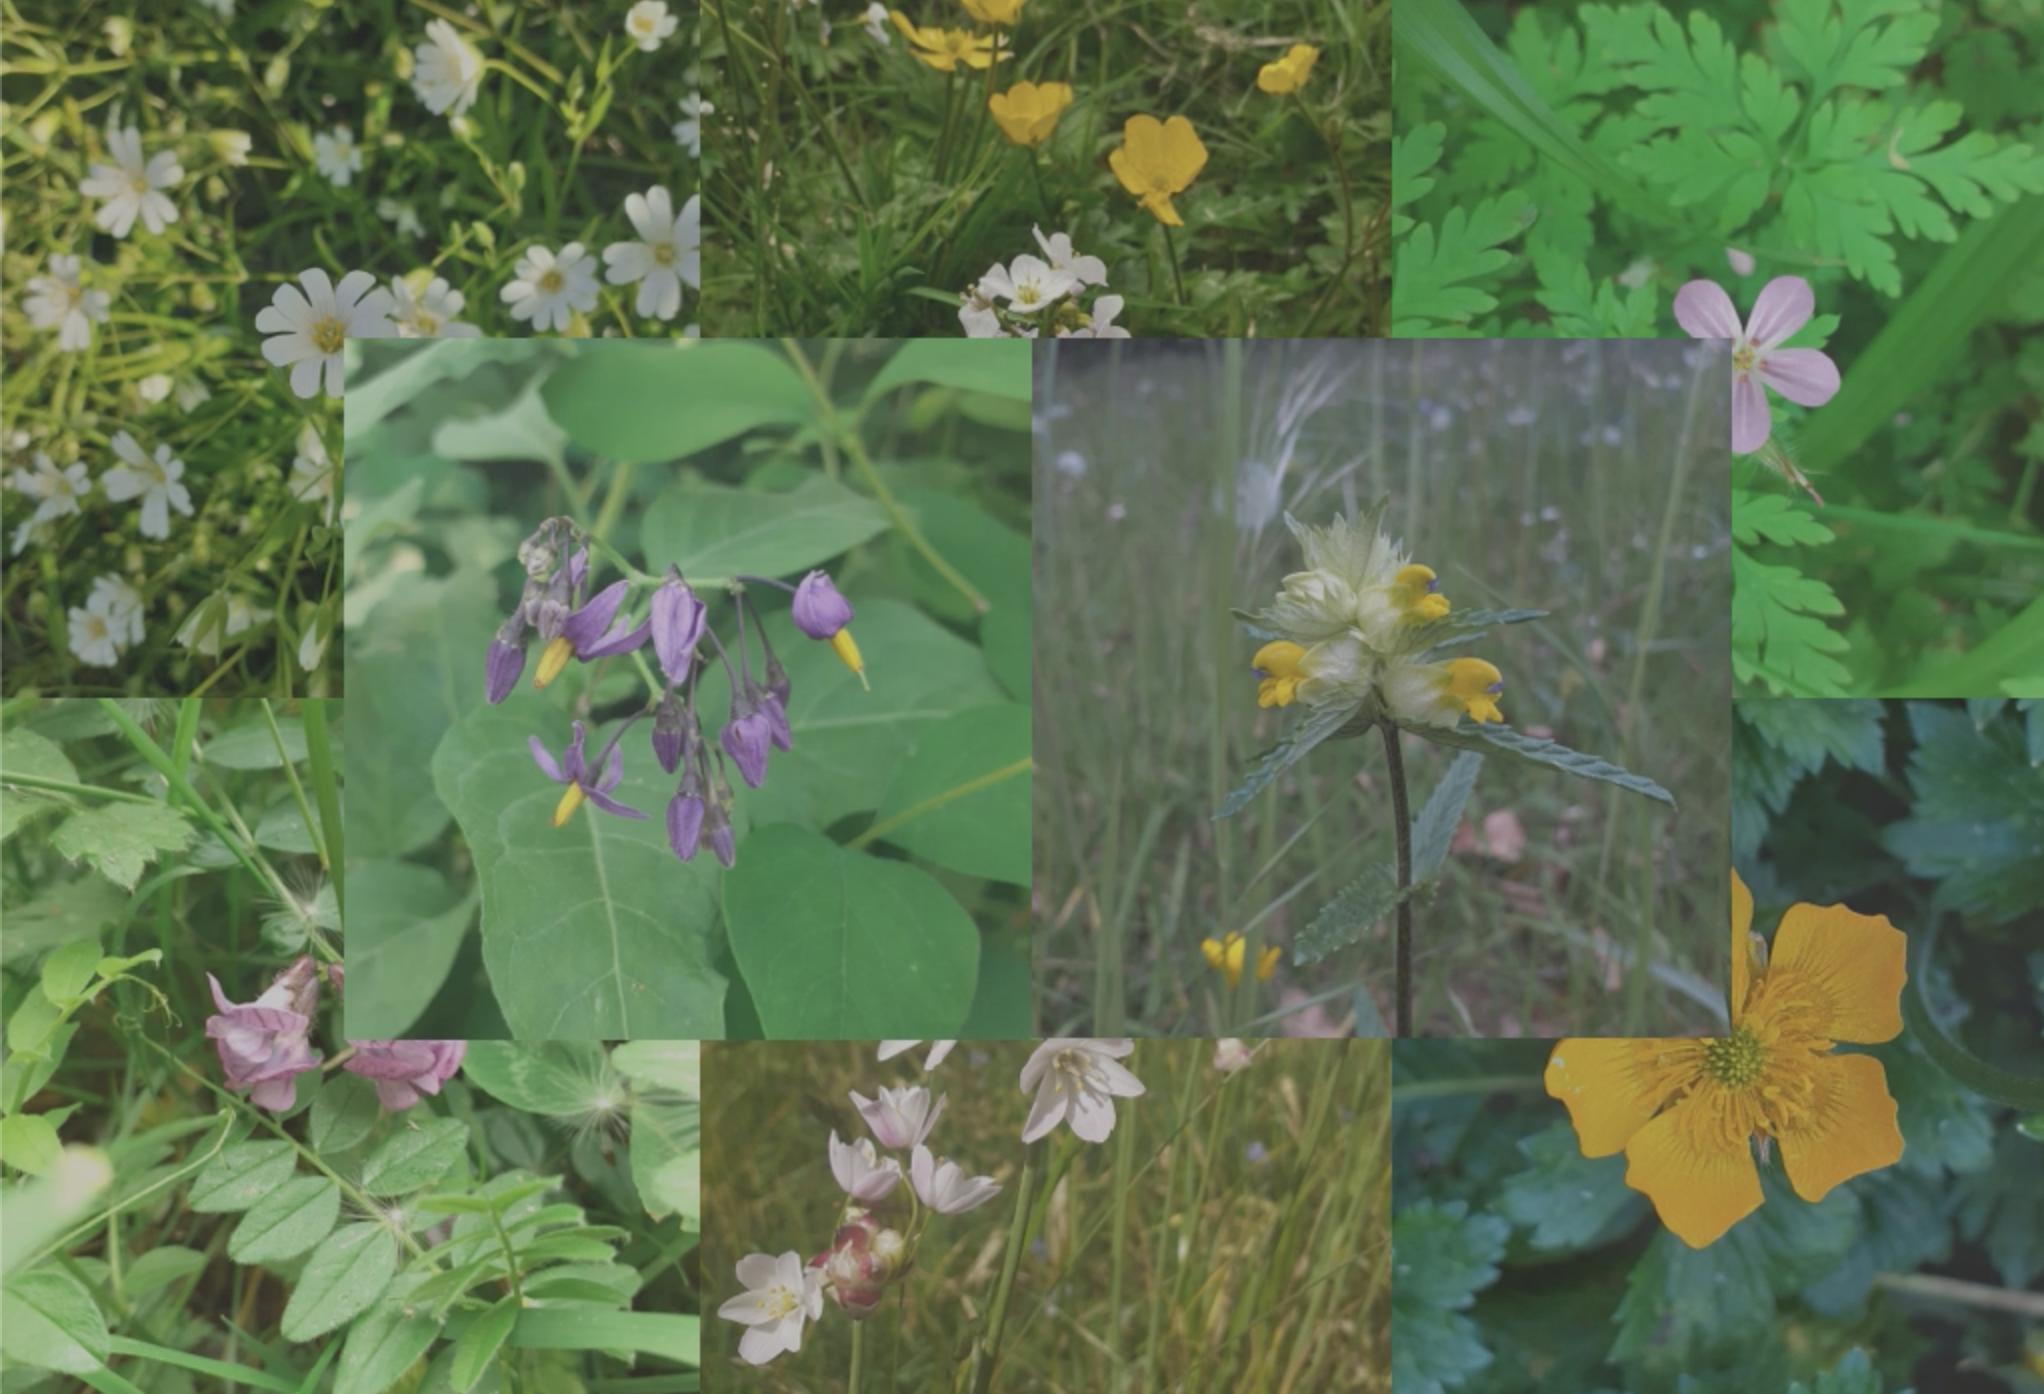 Celebrating Biodiversity: In Praise of Weeds